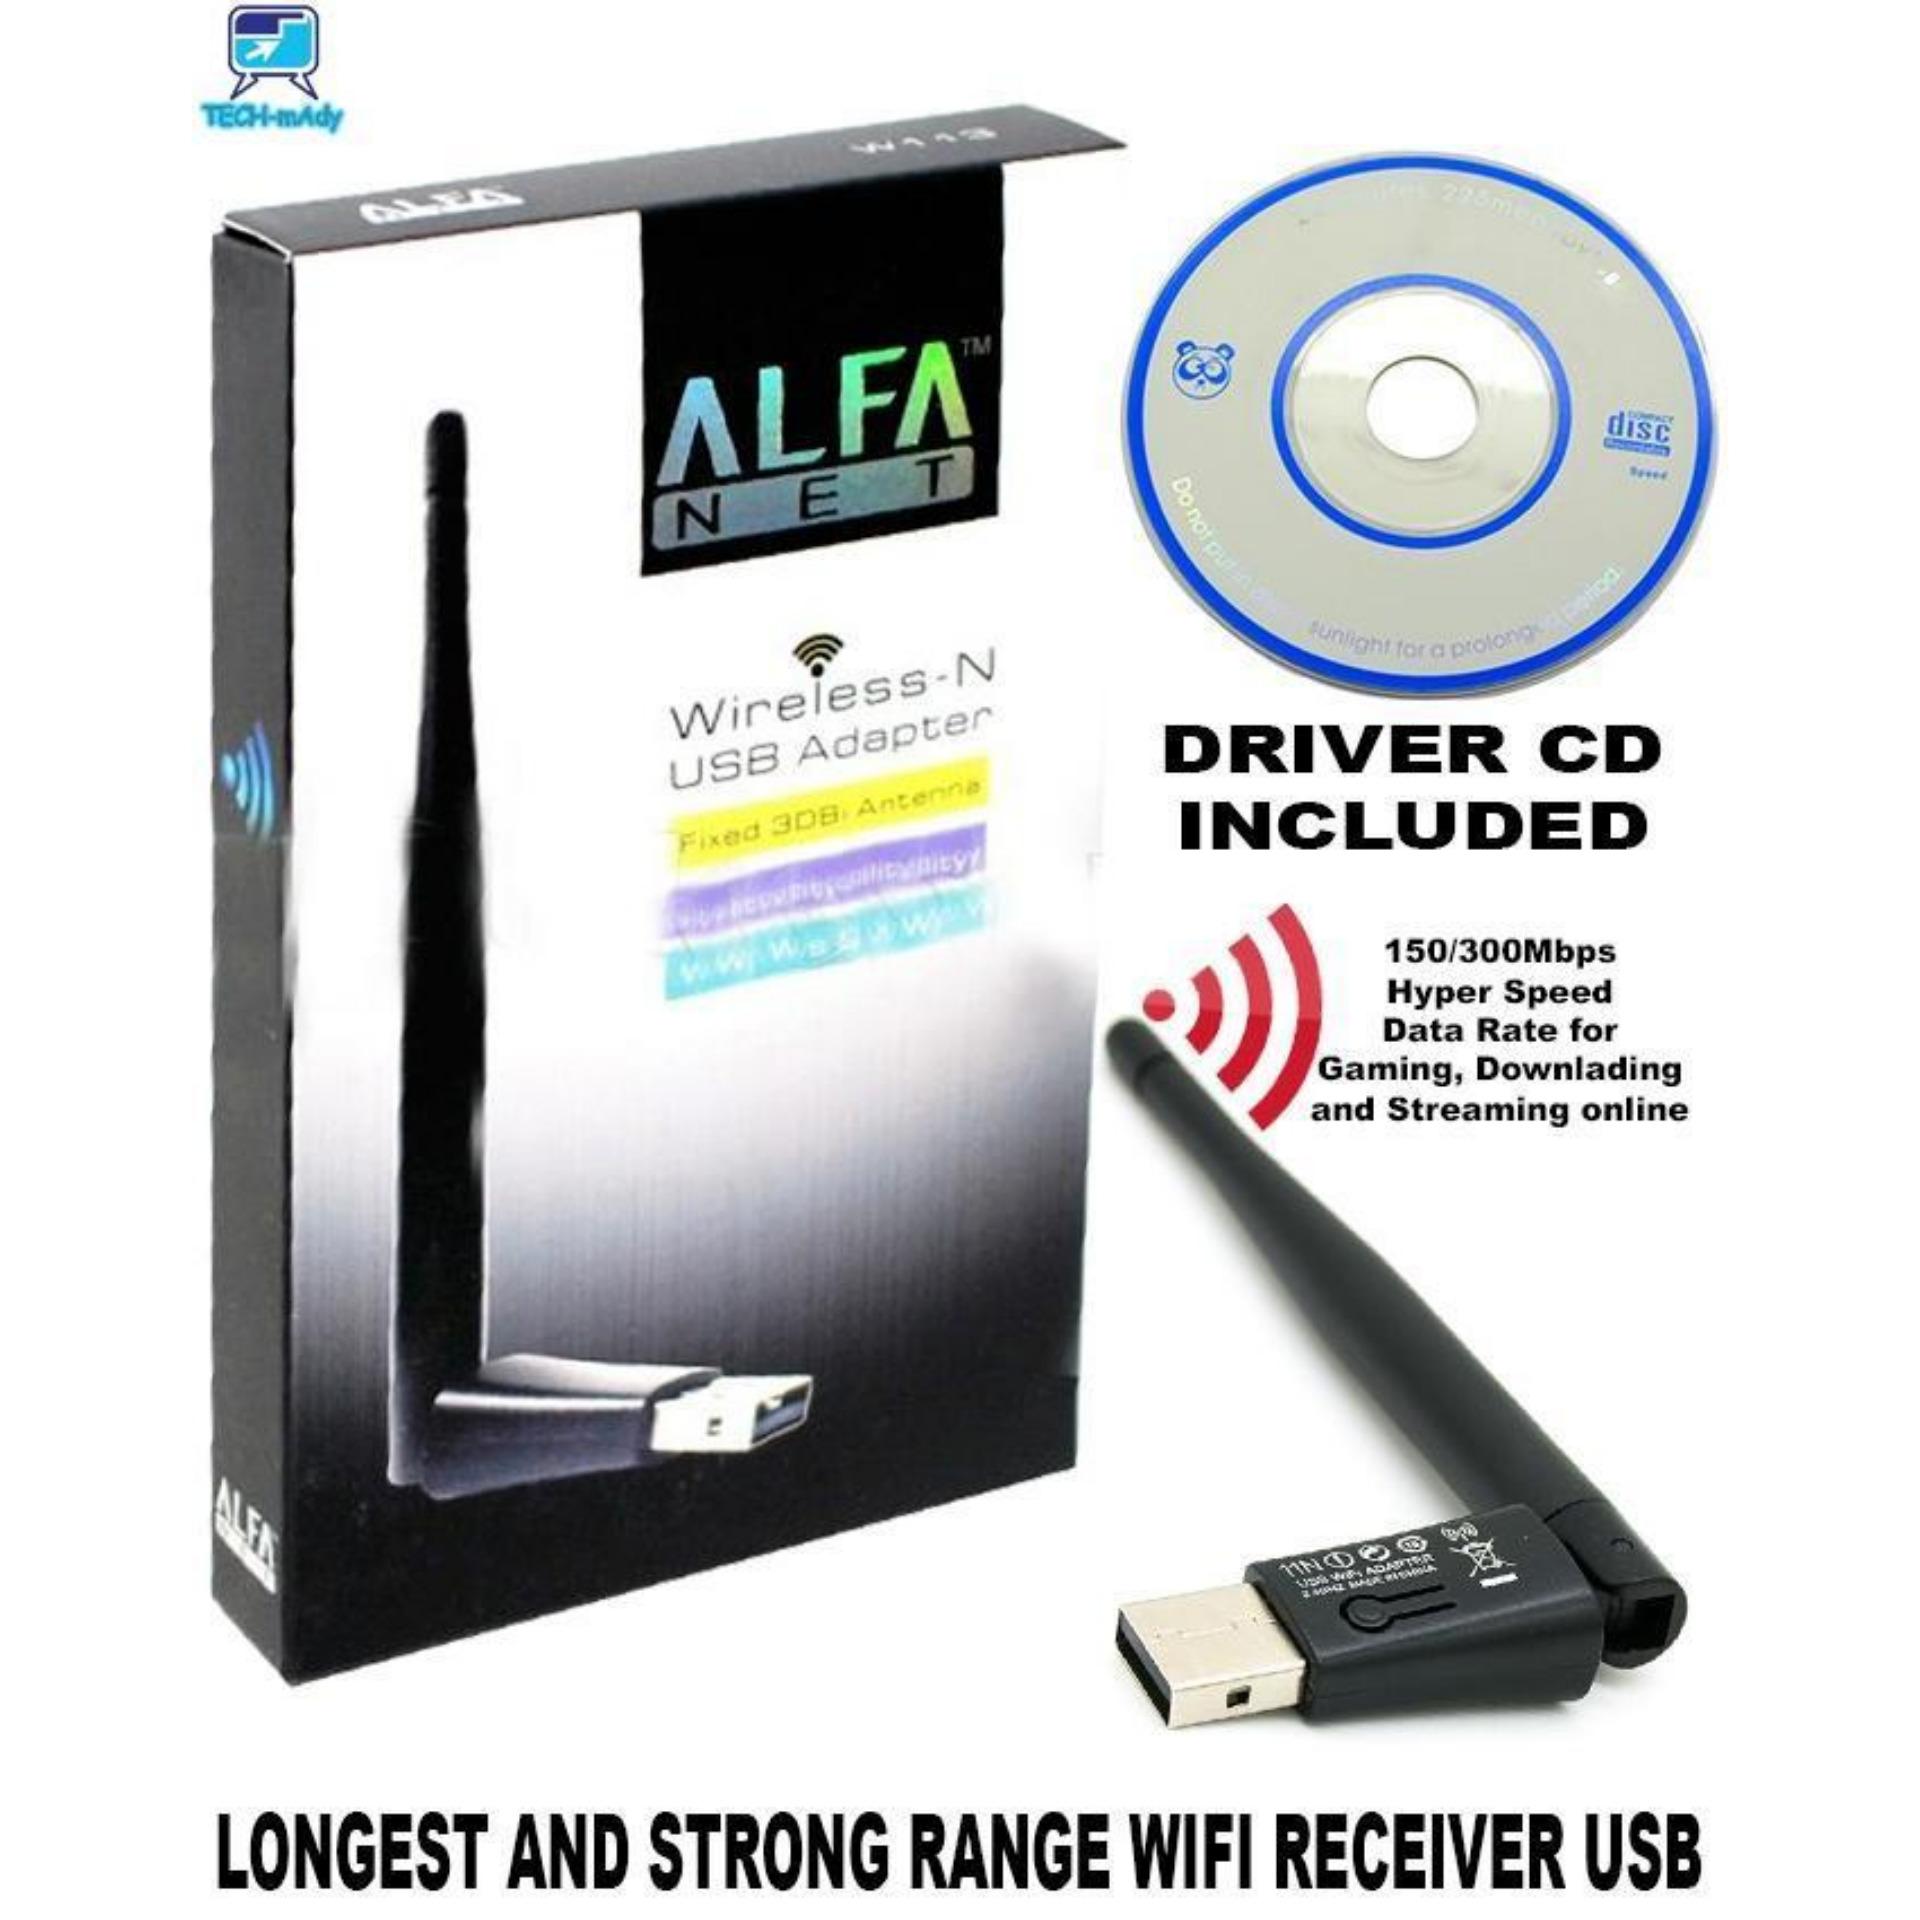 Alfa Wifi Net Wireless-N USB Adapter Fixed 3DBi Antenna Soft AP Wifi Utility For Windows For Pc - W113 also for receiver